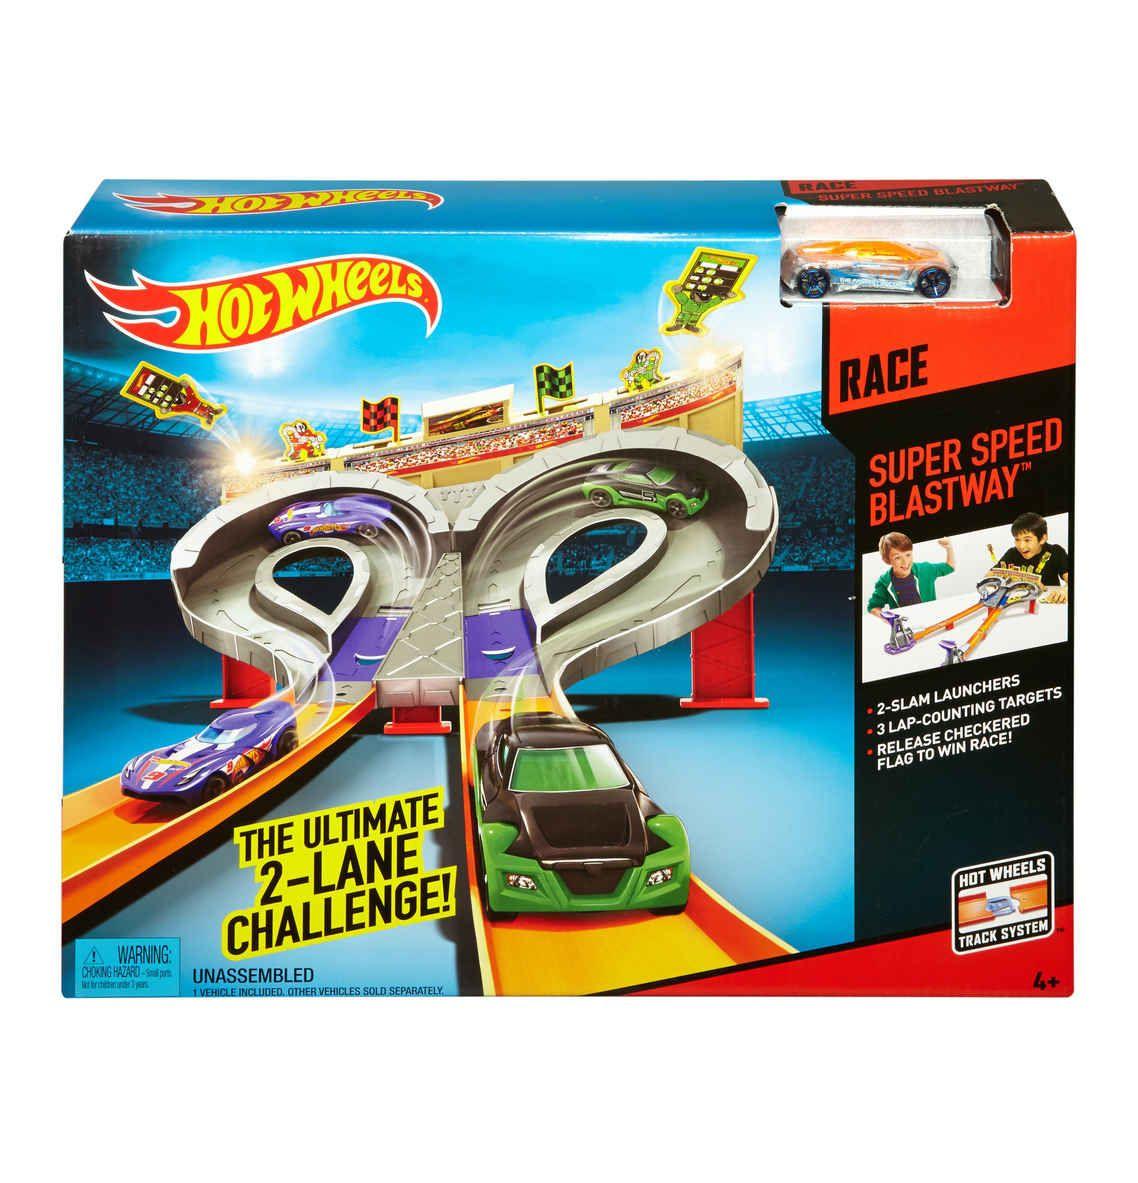 HOT WHEELS Super Speed Blastway Track-Set [12,74 € bei Filialabholung]